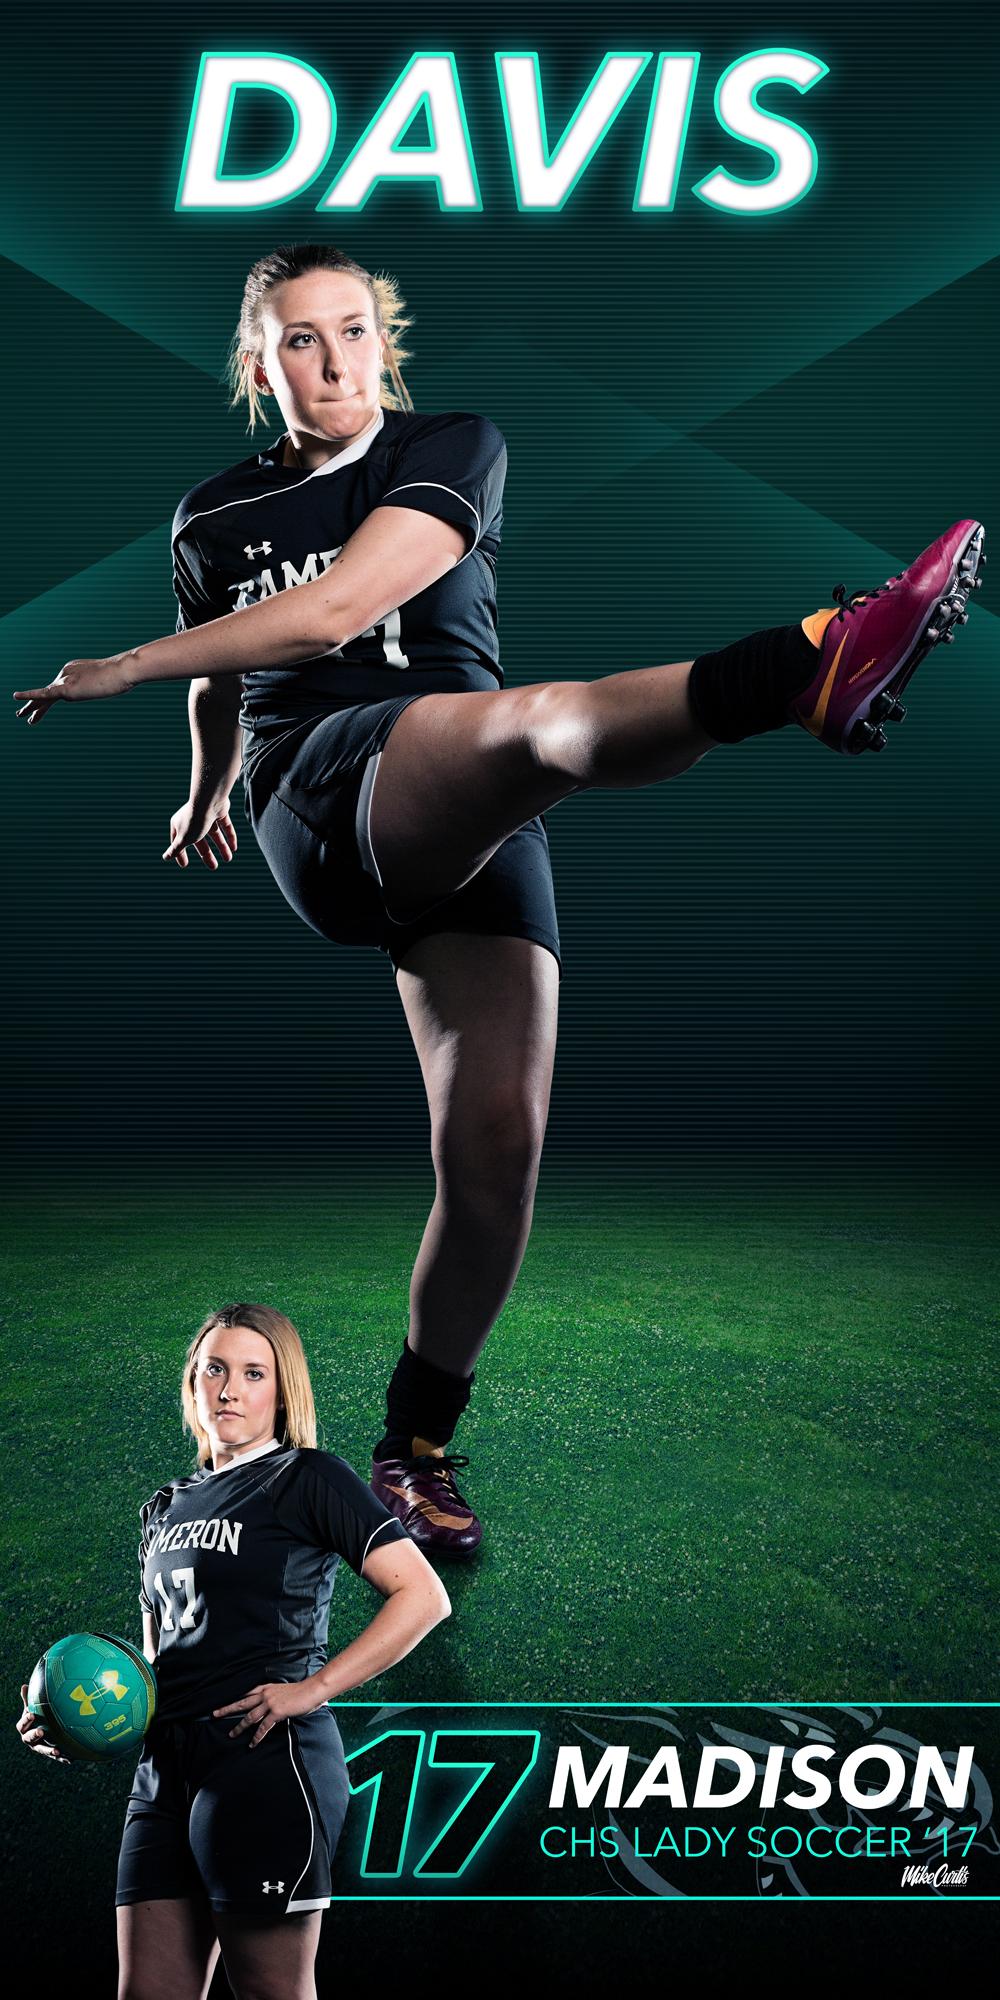 CHS-Lady-Soccer-17_Davis_2x4-Banner.jpg